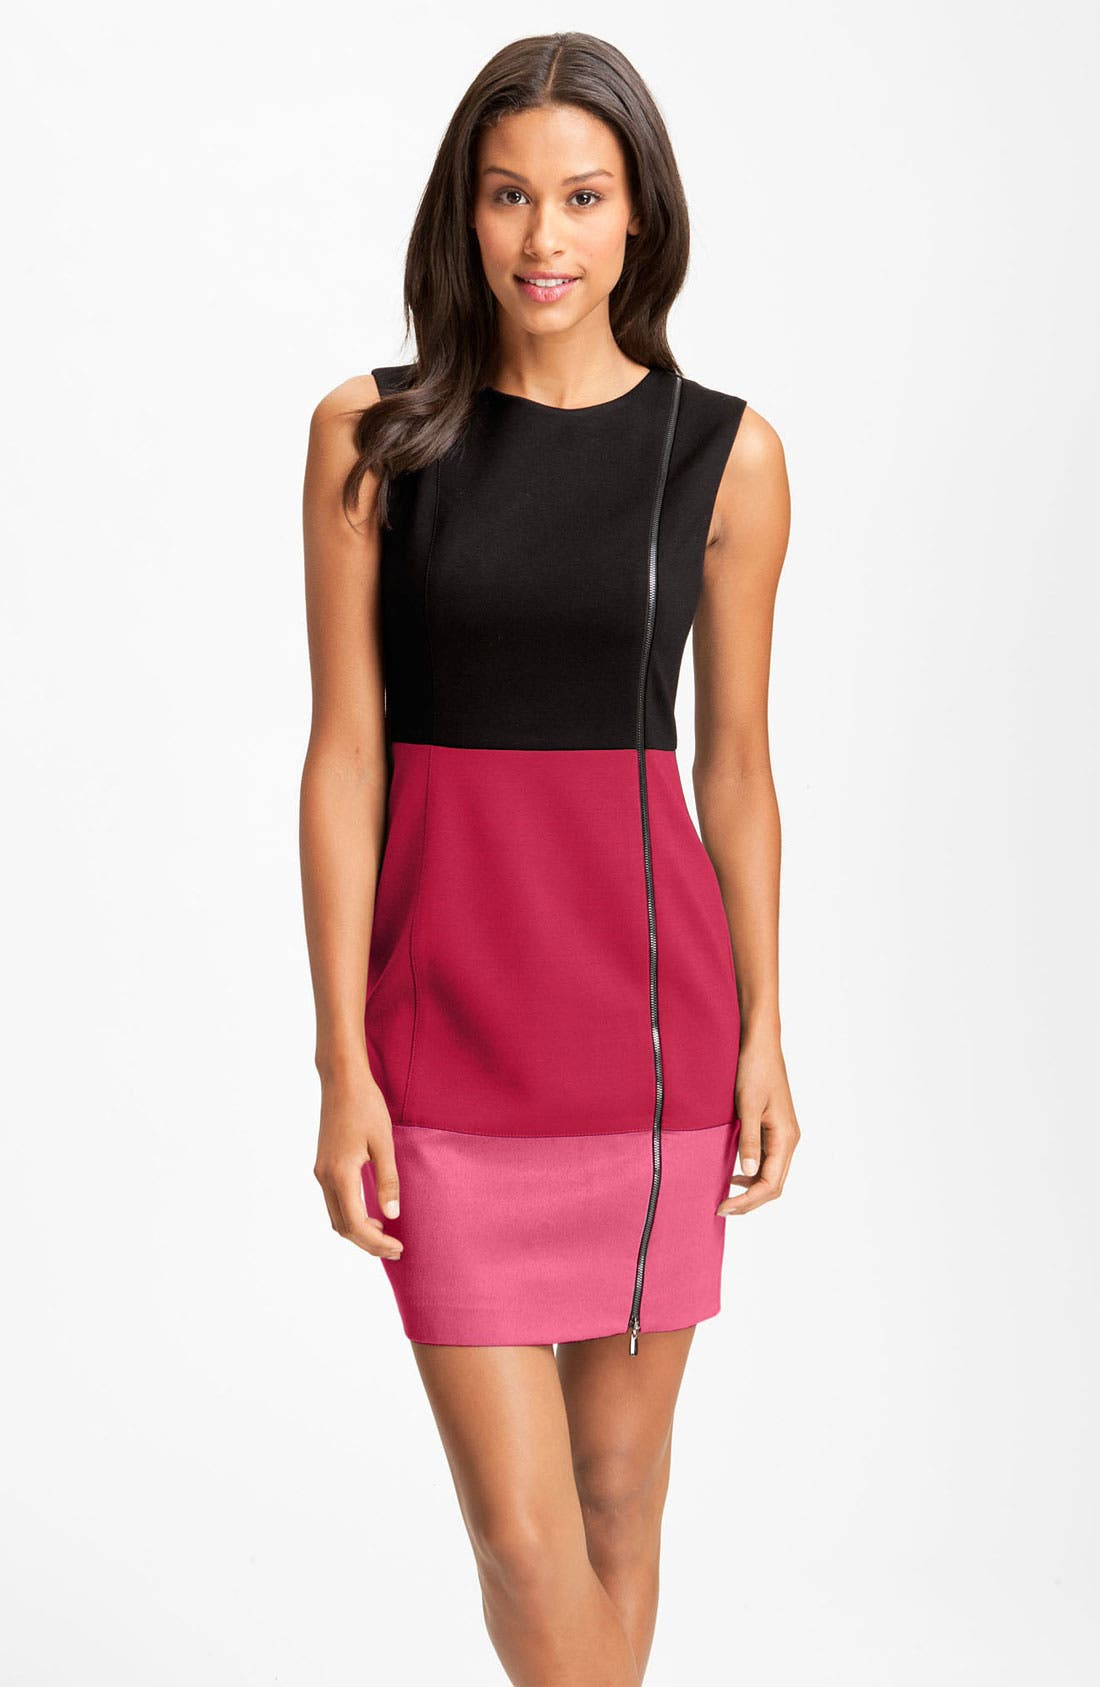 Alternate Image 1 Selected - Laundry by Shelli Segal Colorblock Exposed Zipper Sheath Dress